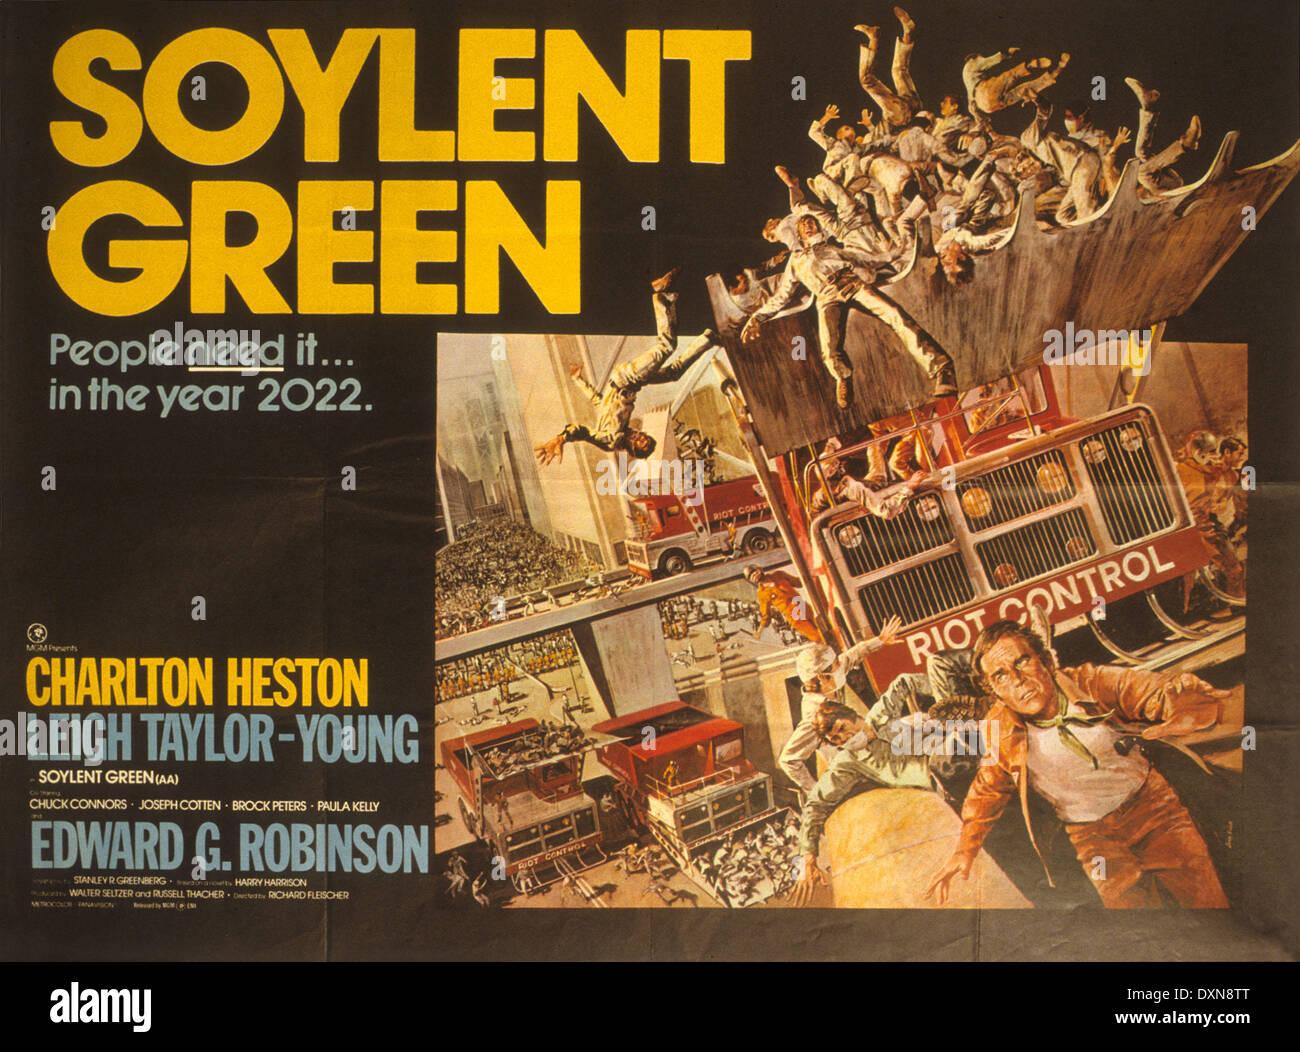 soylent green full movie download